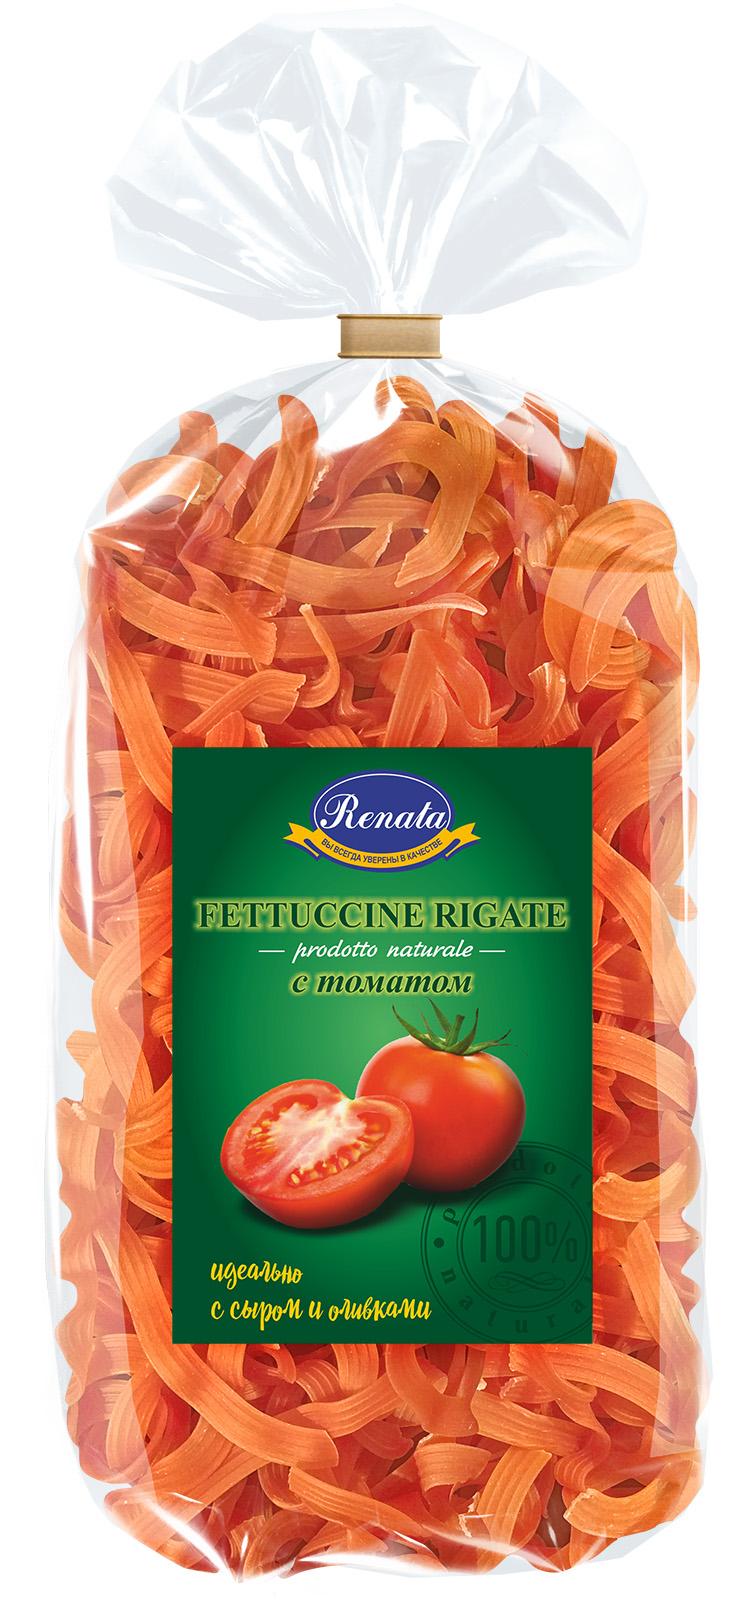 Макароны «Renata» Fettuccine rigate лапша рифленая с томатом, 350